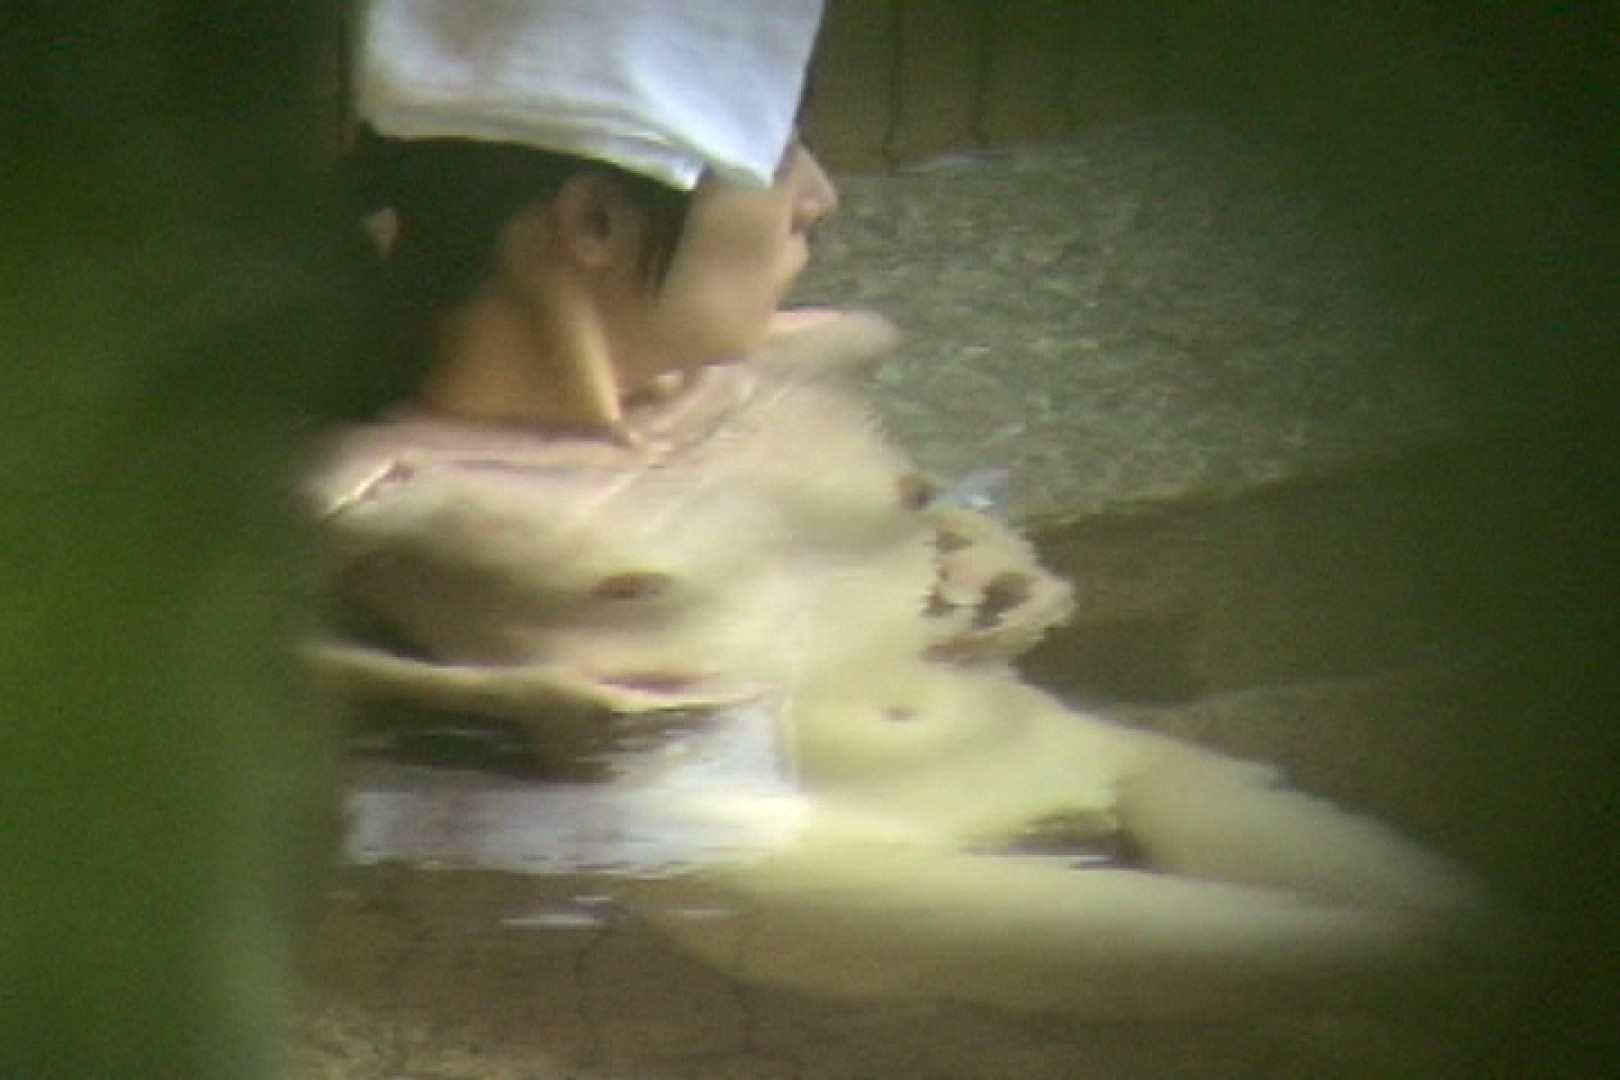 Aquaな露天風呂Vol.701 0  89連発 40